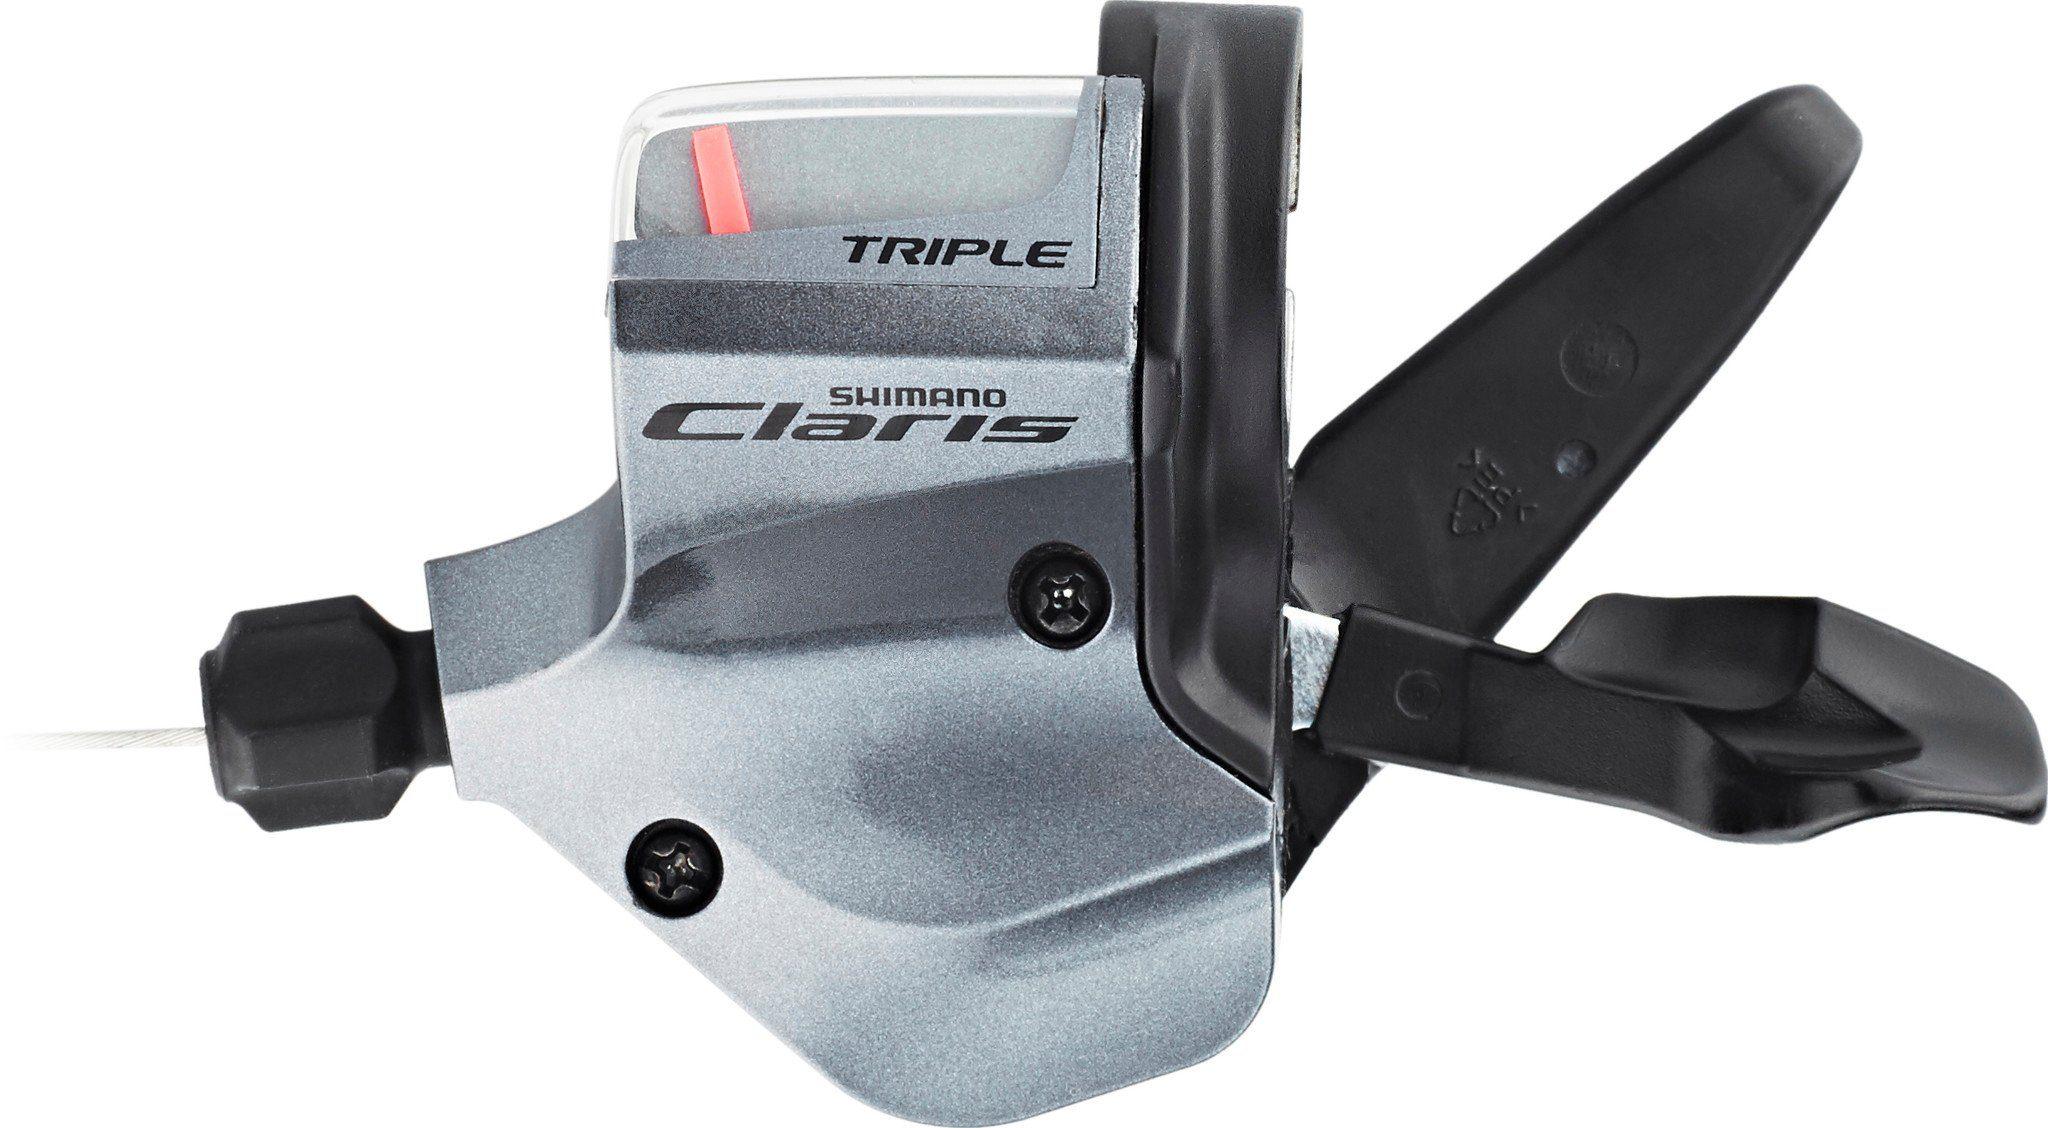 Shimano Schaltung »Claris SL-2400/2403 Schalthebel 3-fach links«